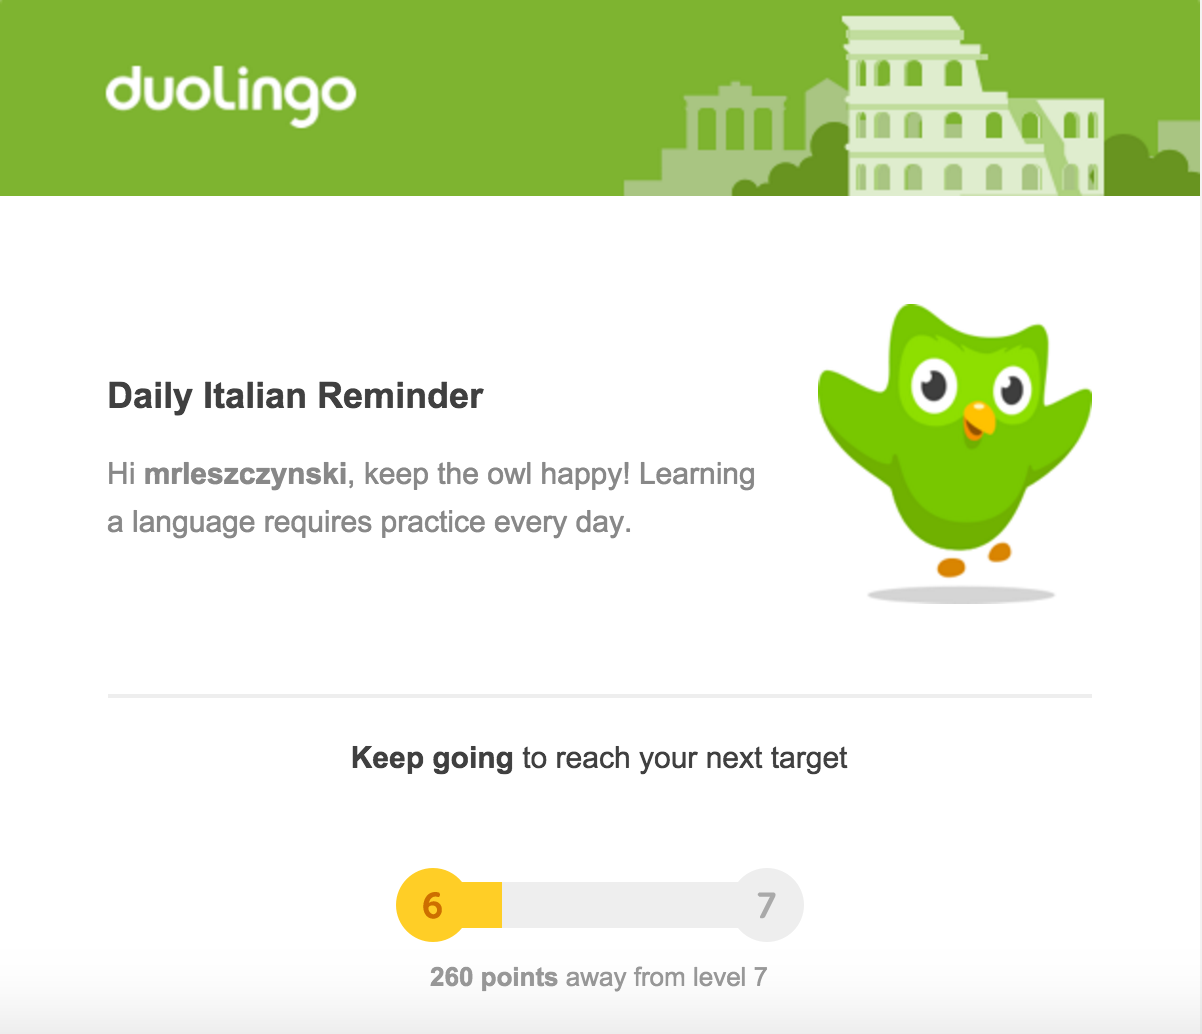 duo lingo italian email